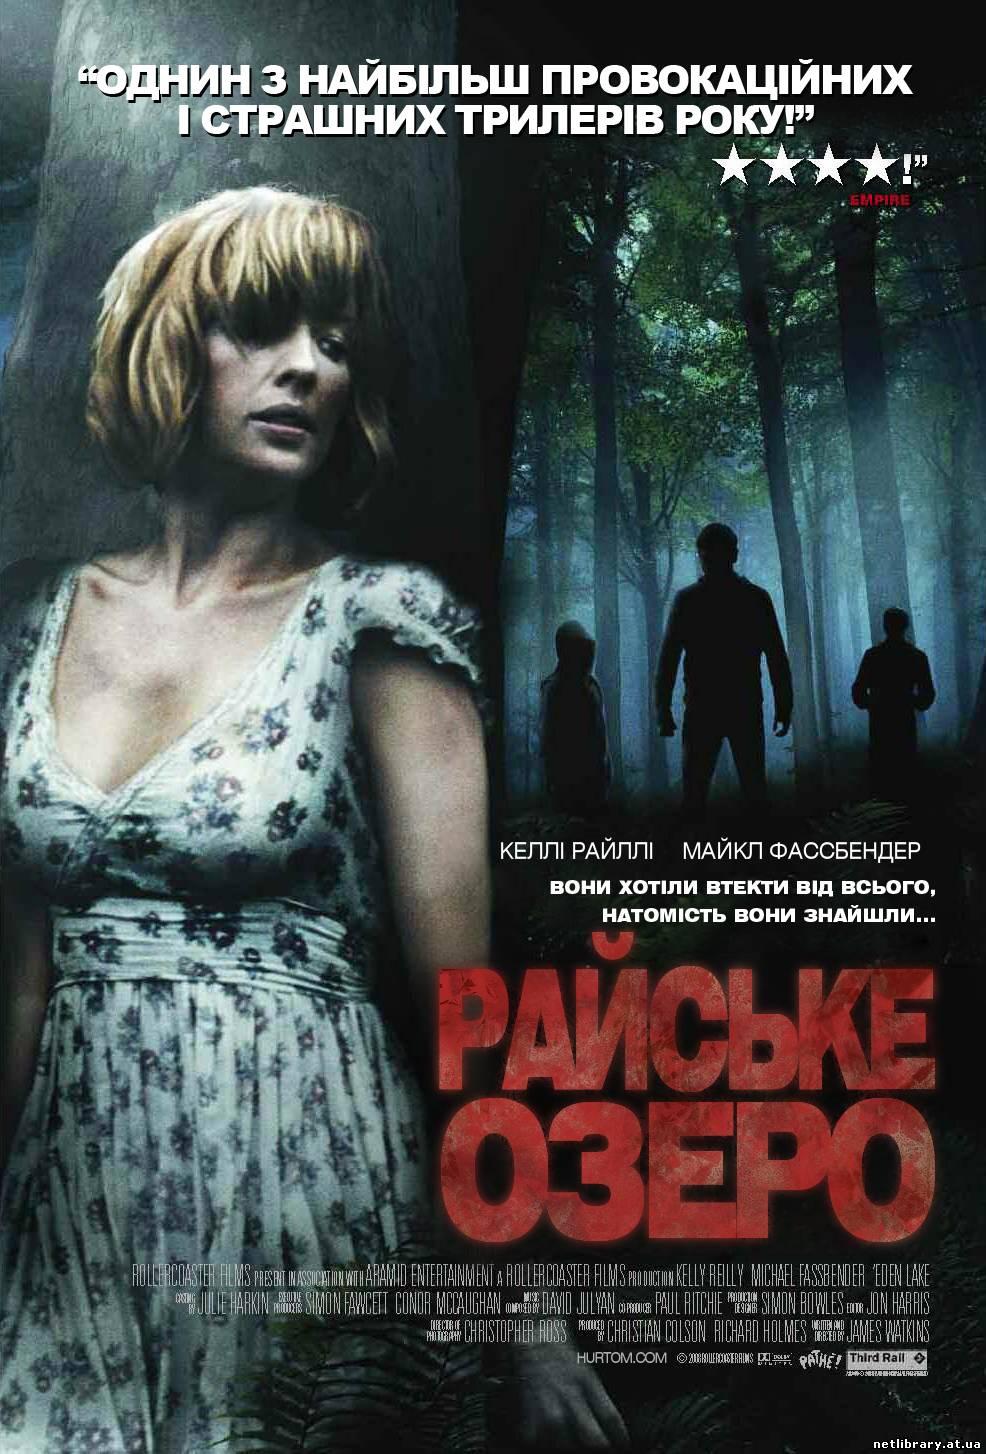 Райське озеро [HD 720p] / Eden Lake [HD 720p] (2008) укр дубляж онлайн